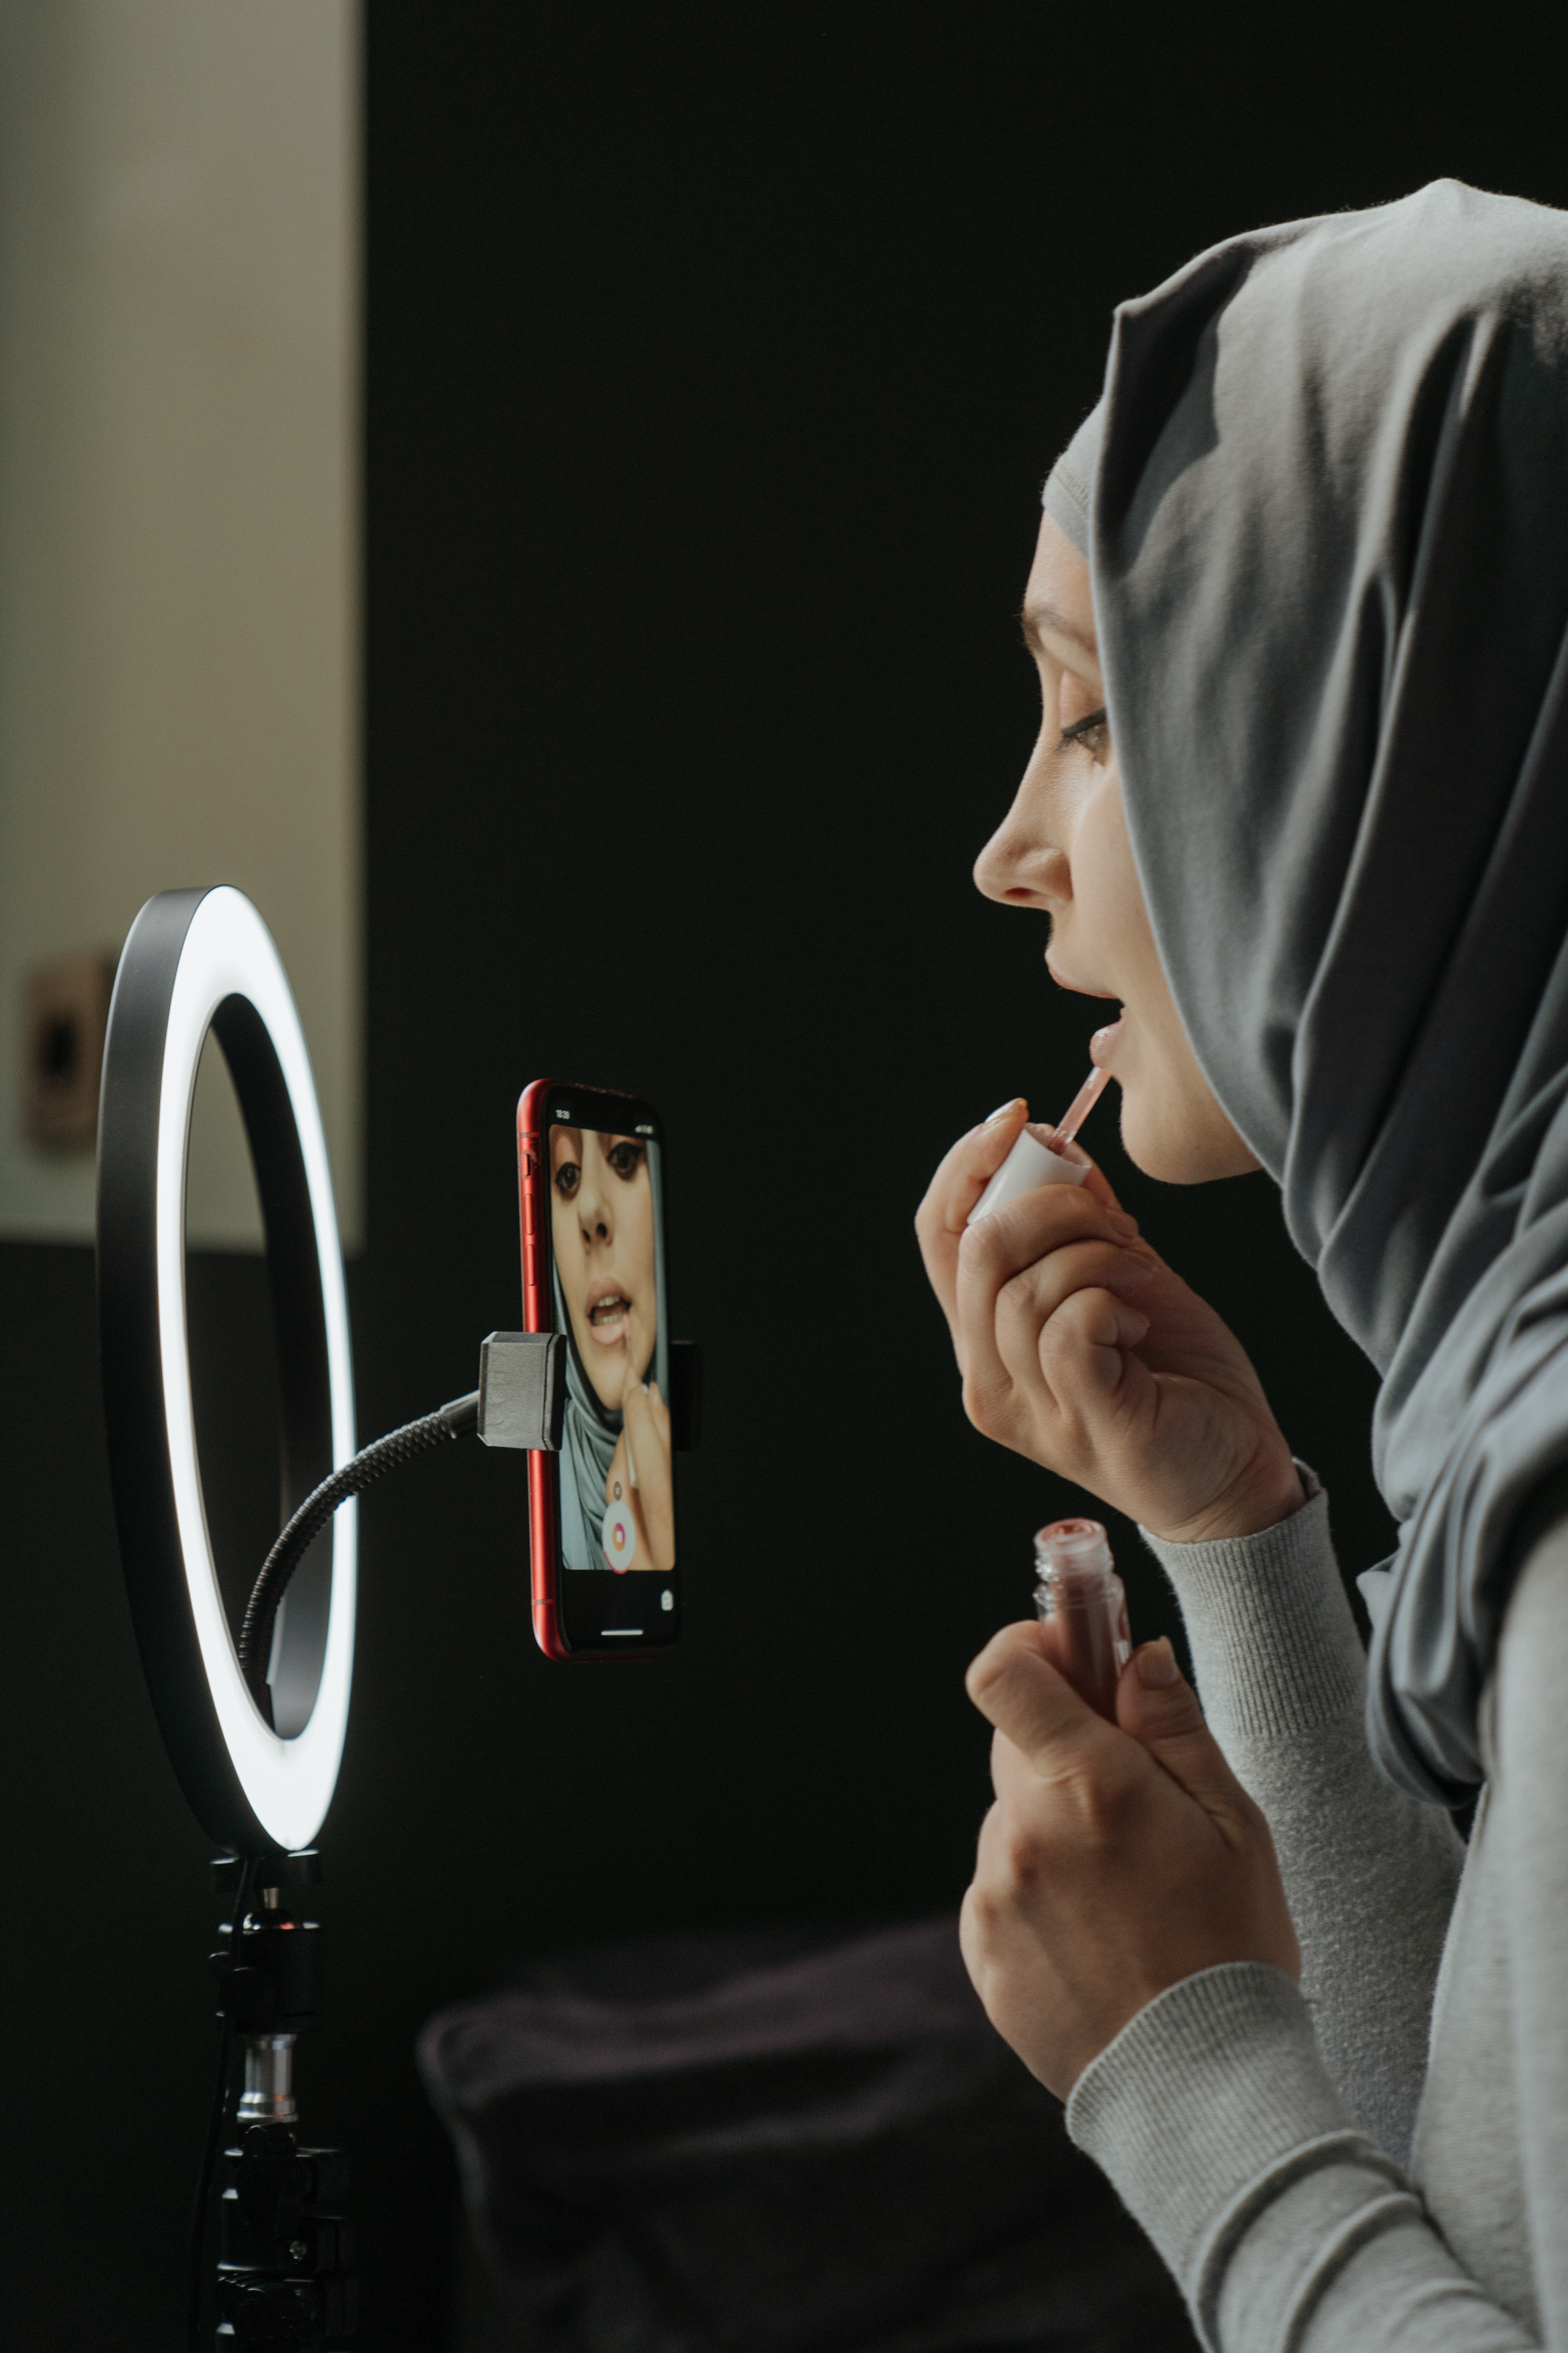 woman-in-gray-hijab-holding-iphone-4620809.jpg